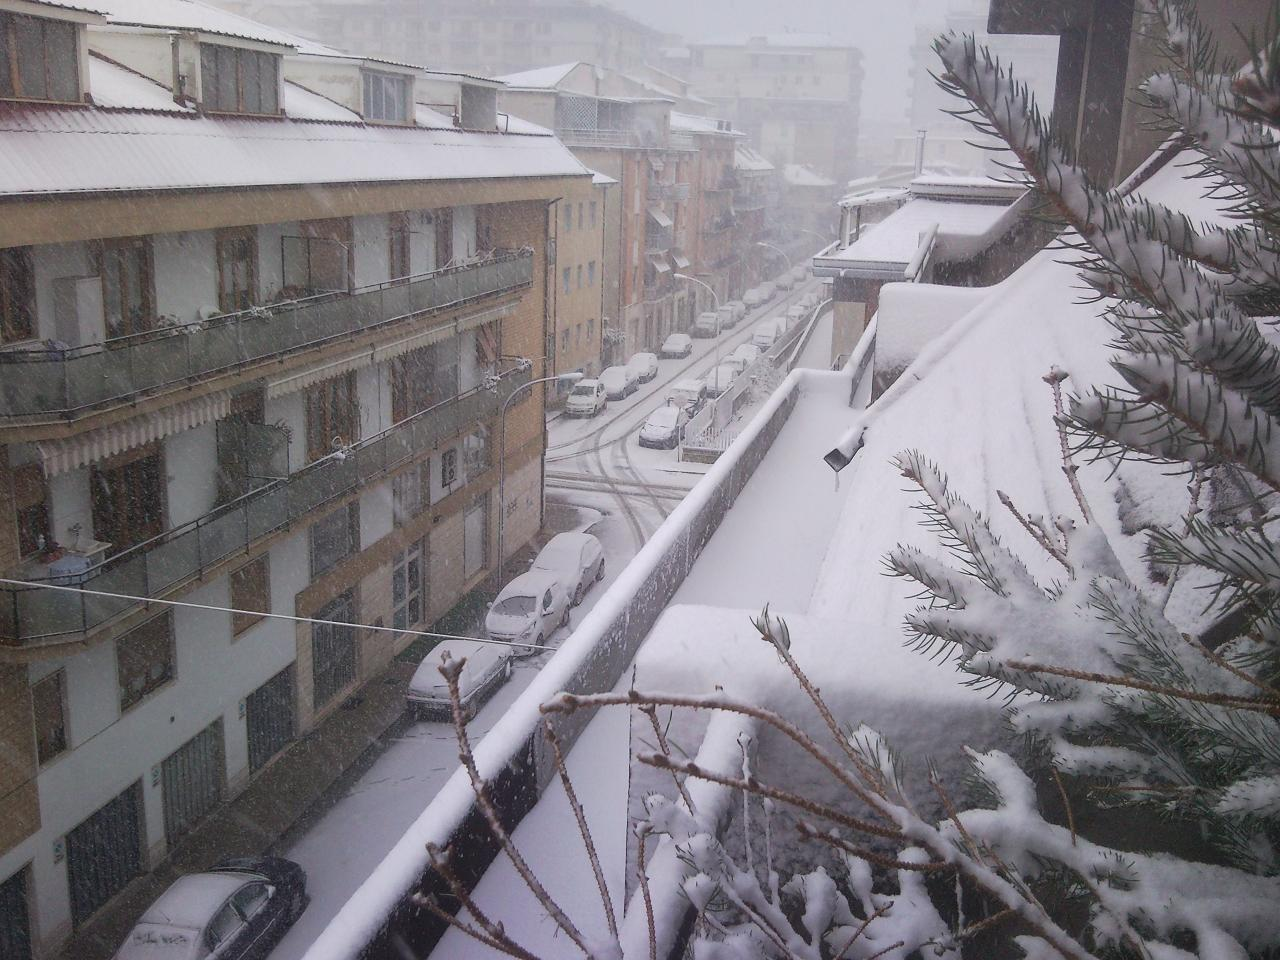 San Benedetto, via Toscana, 3 febbraio 2012